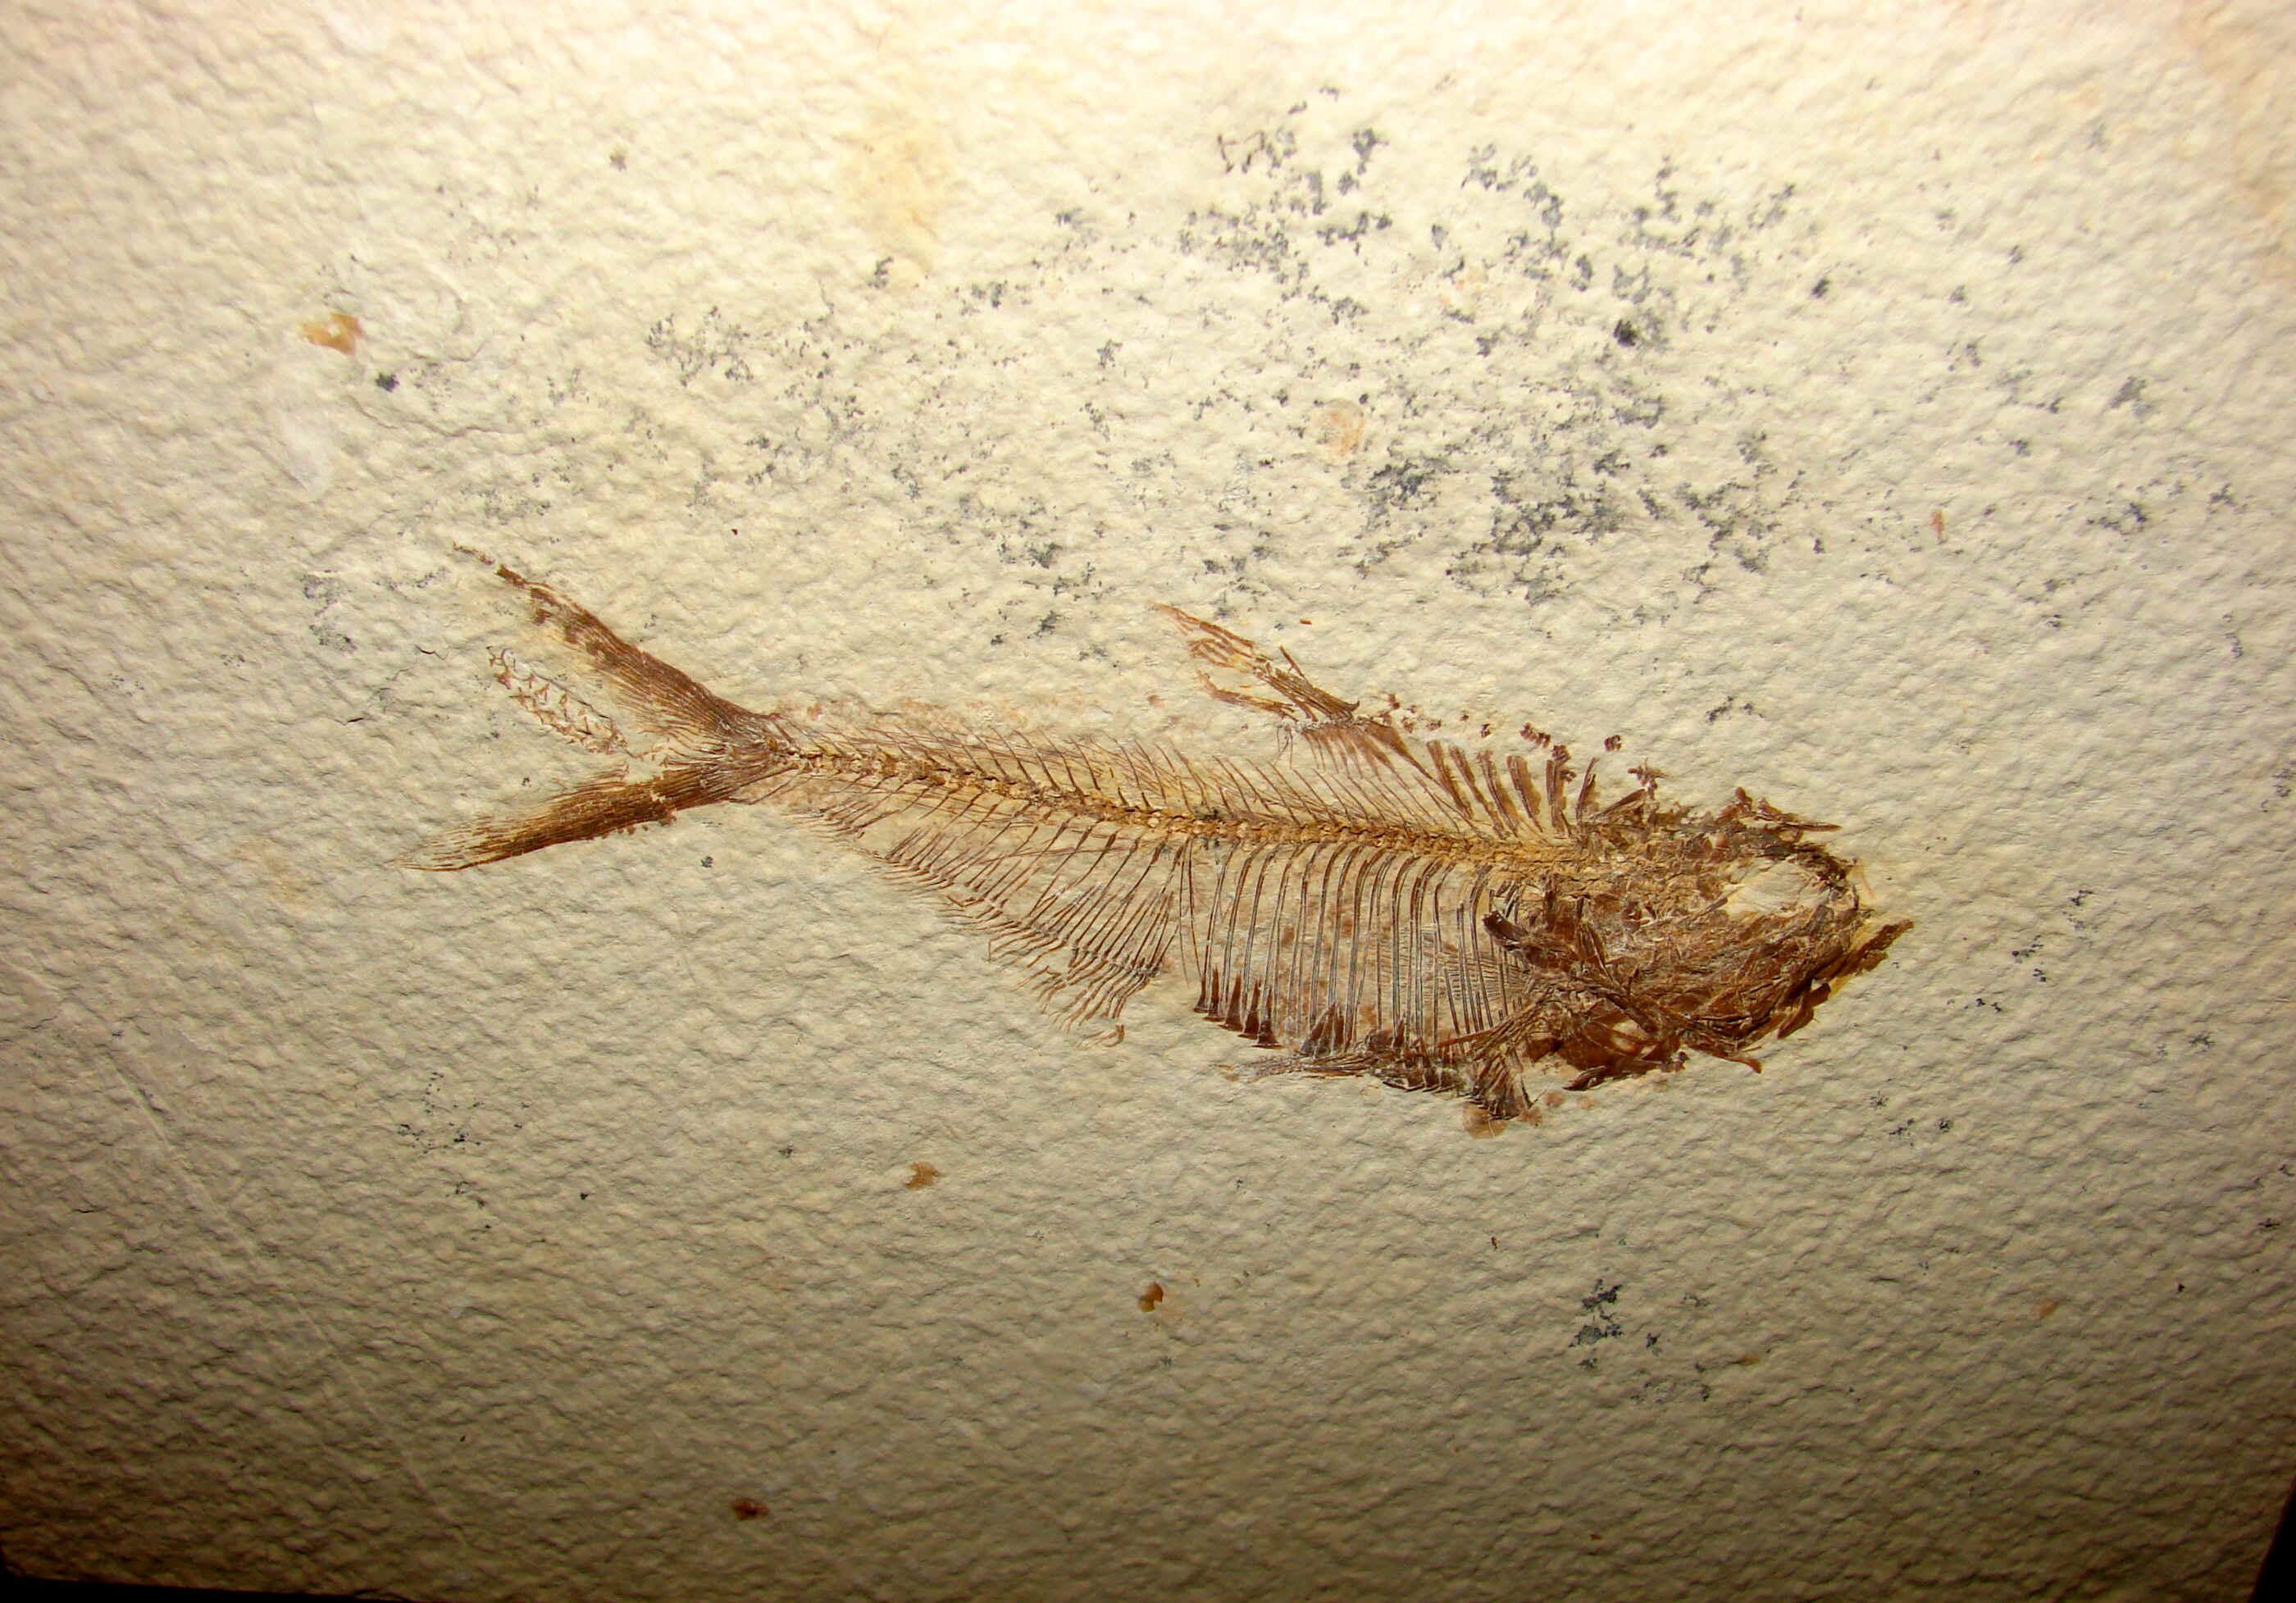 http://www.artfromgod.com/fossilfish-11.jpg (807370 bytes)